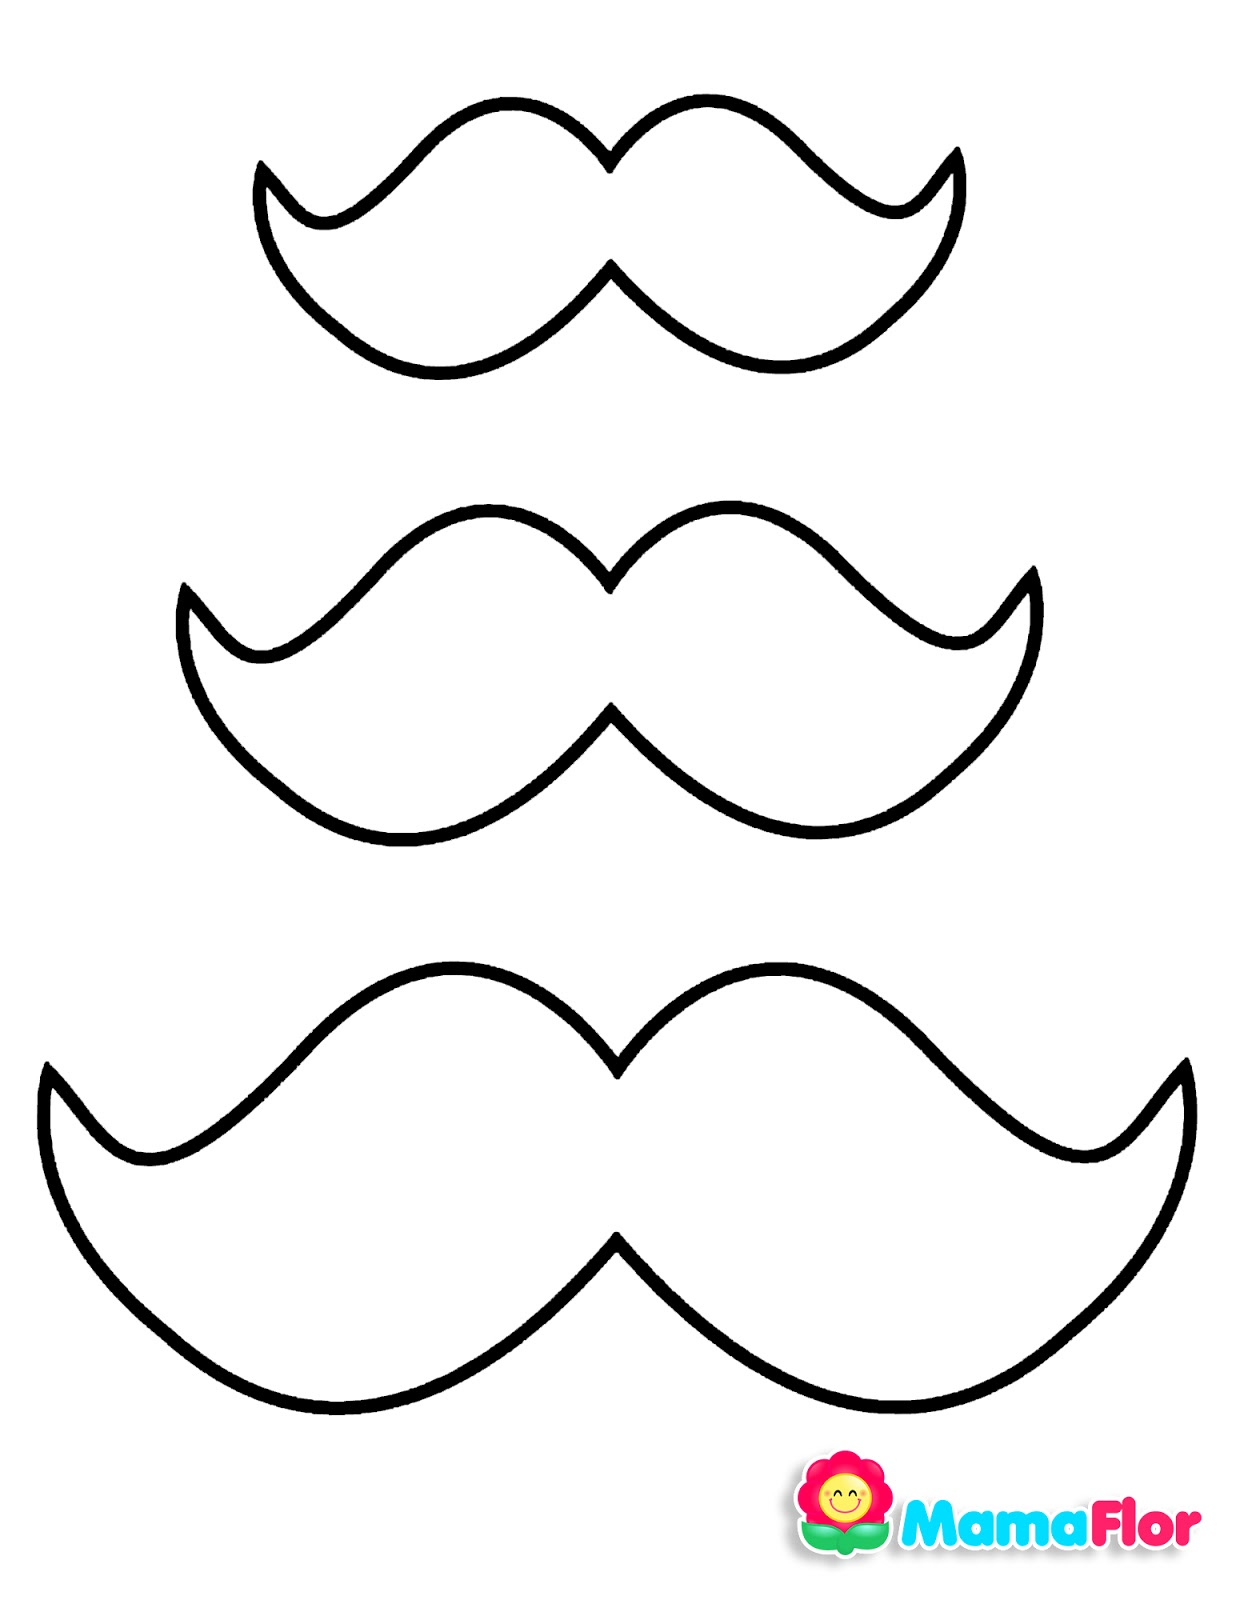 moldes bigotes sombrero lentes corbatas michi dia del padre